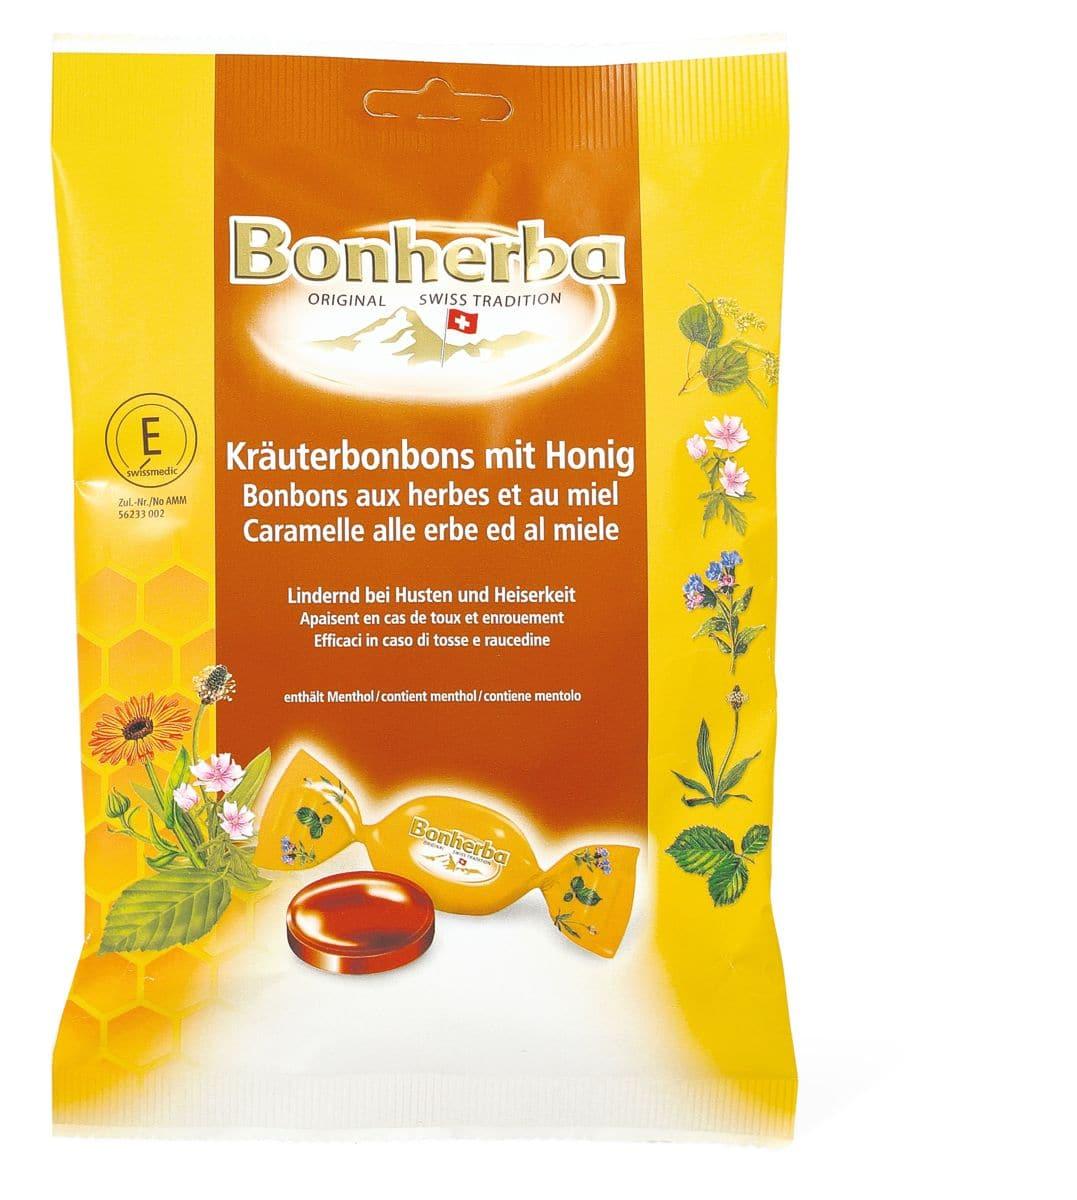 Bonherba Caramelle alle erbe e al miele